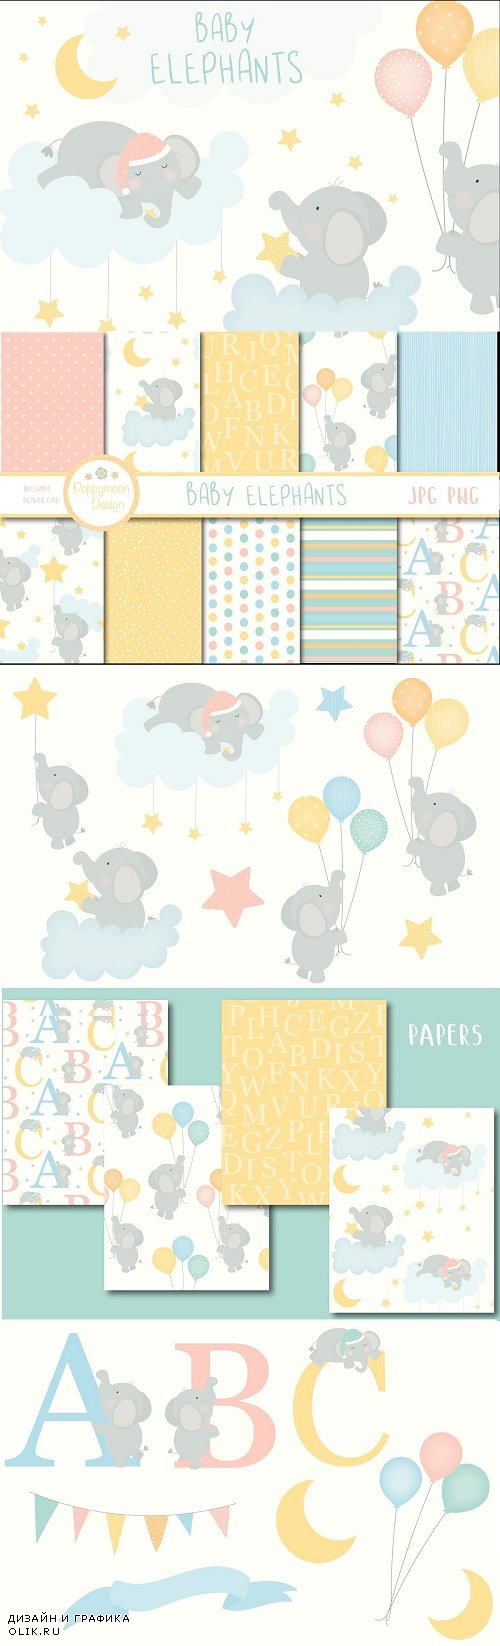 Baby Elephant set (clipart + paper) - 3816666 - 3816667